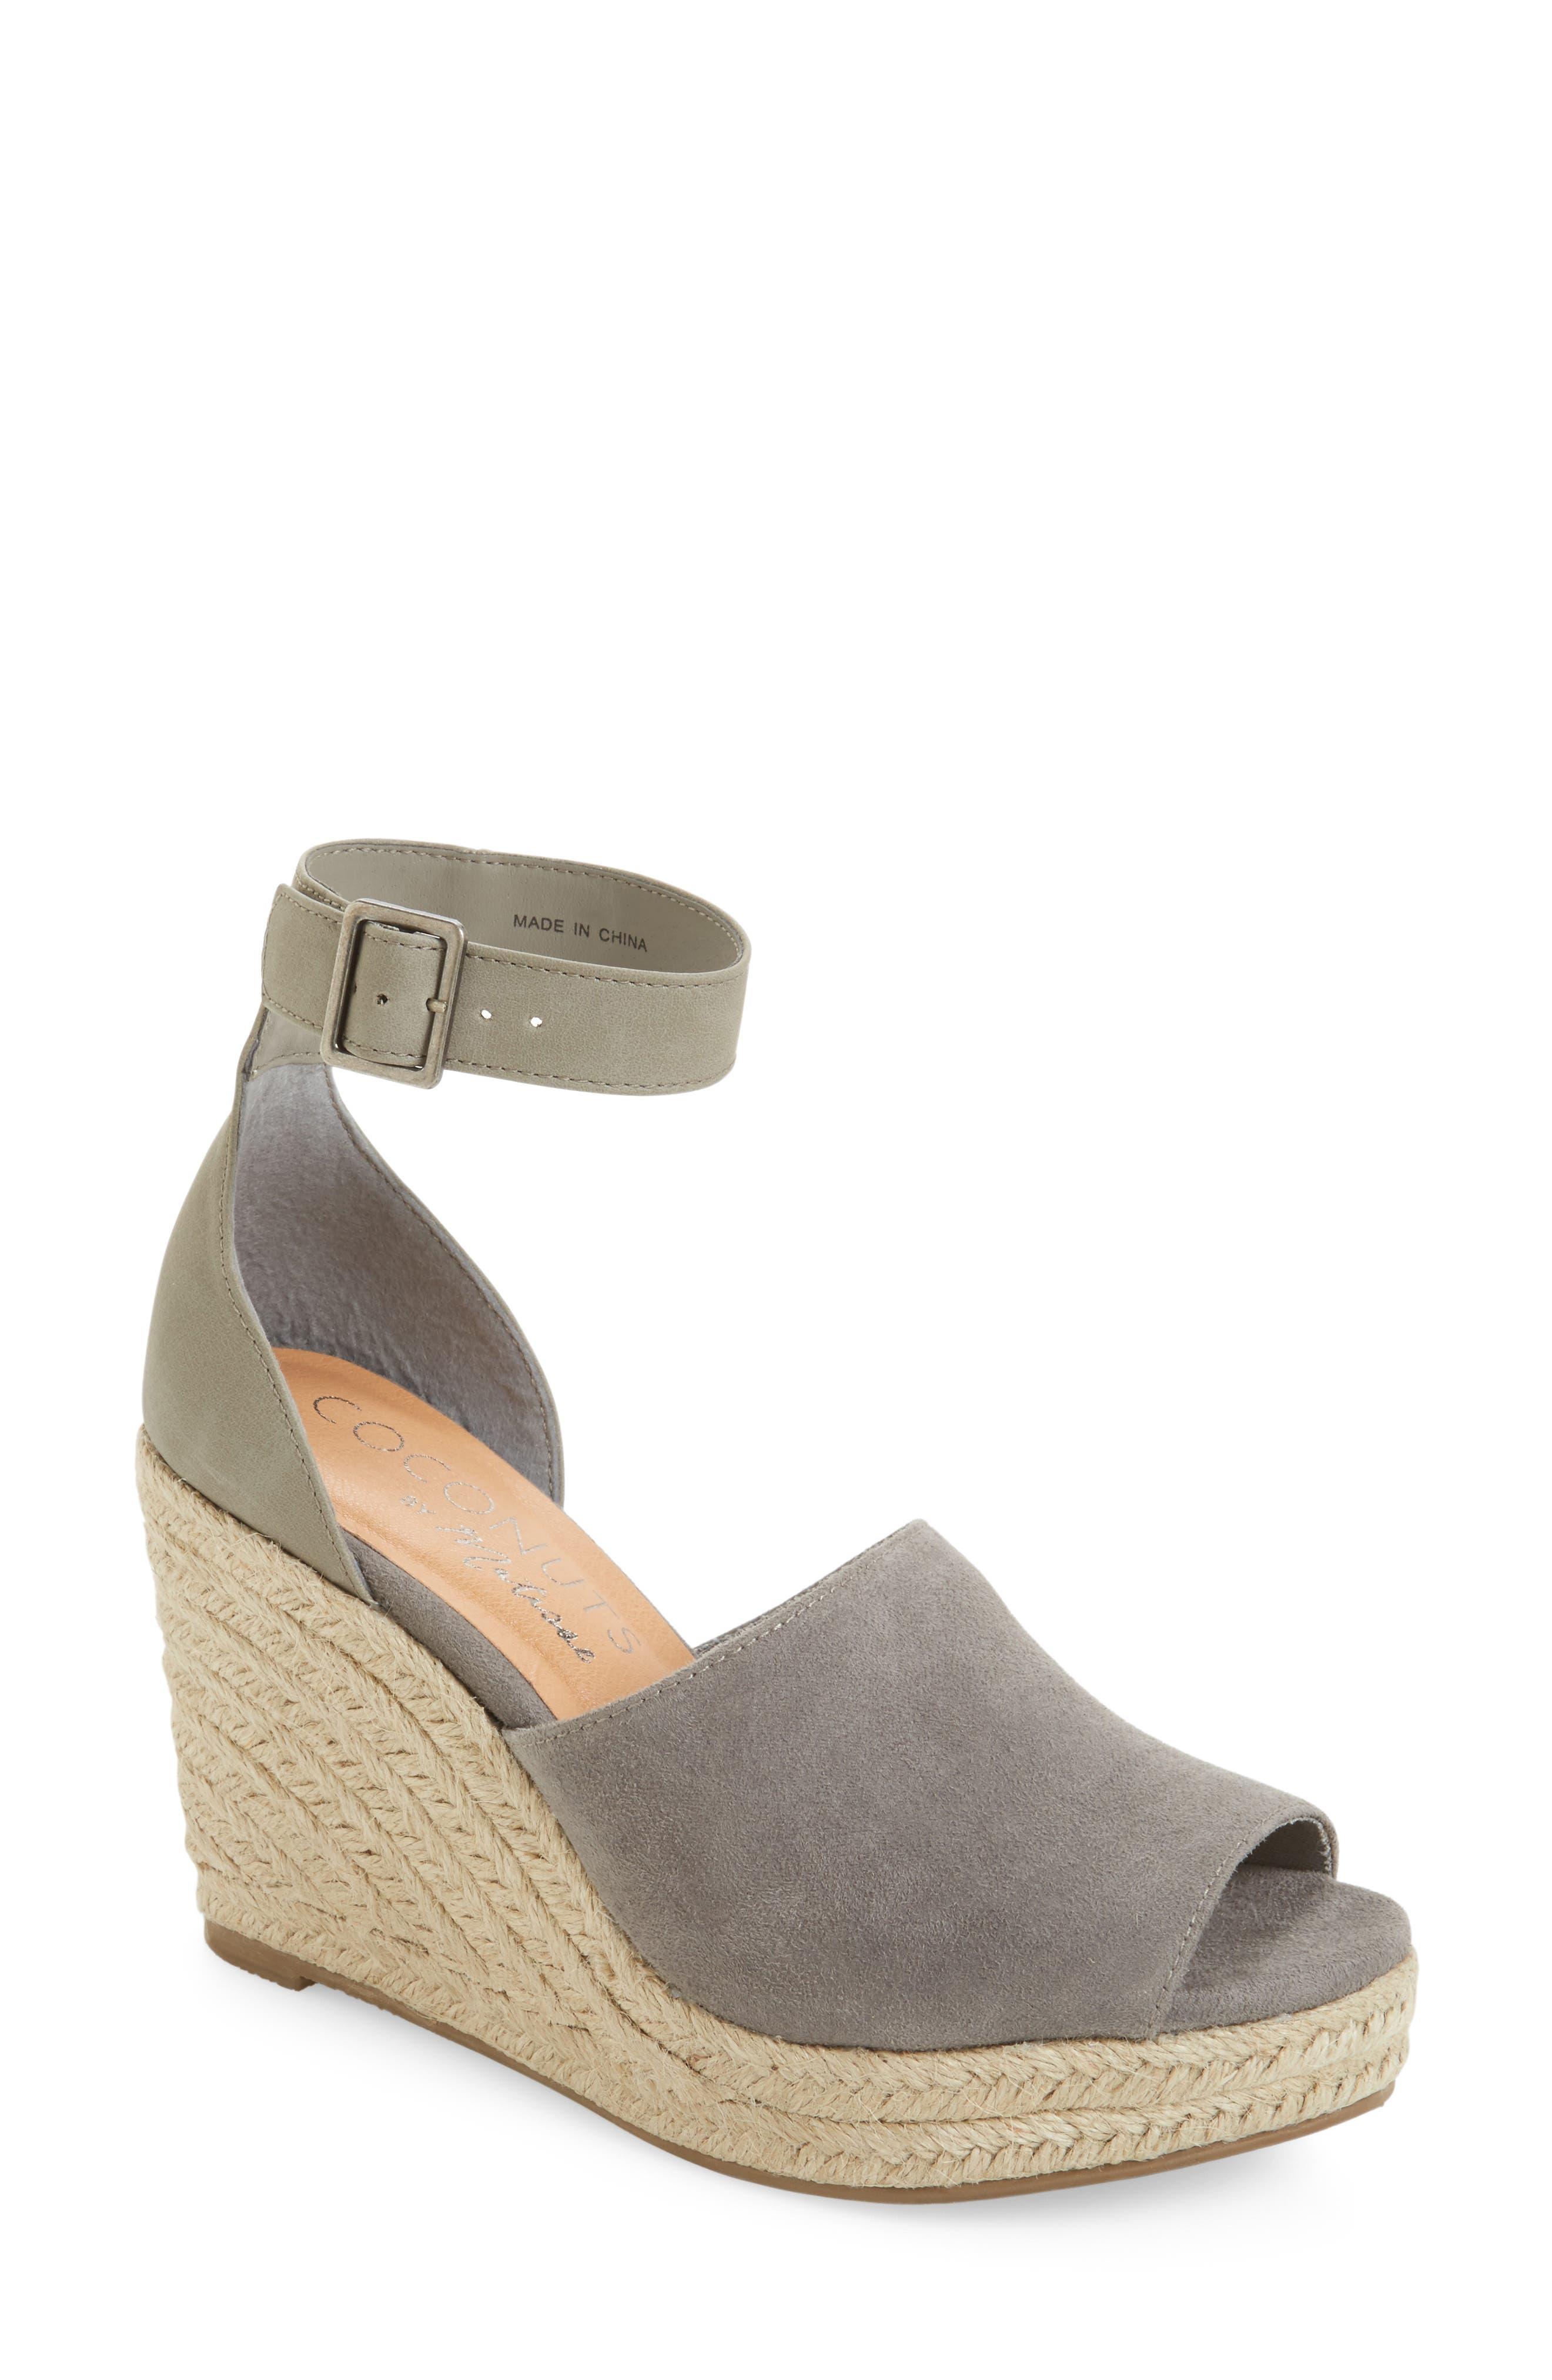 Flamingo Wedge Sandal,                         Main,                         color, Grey Leather